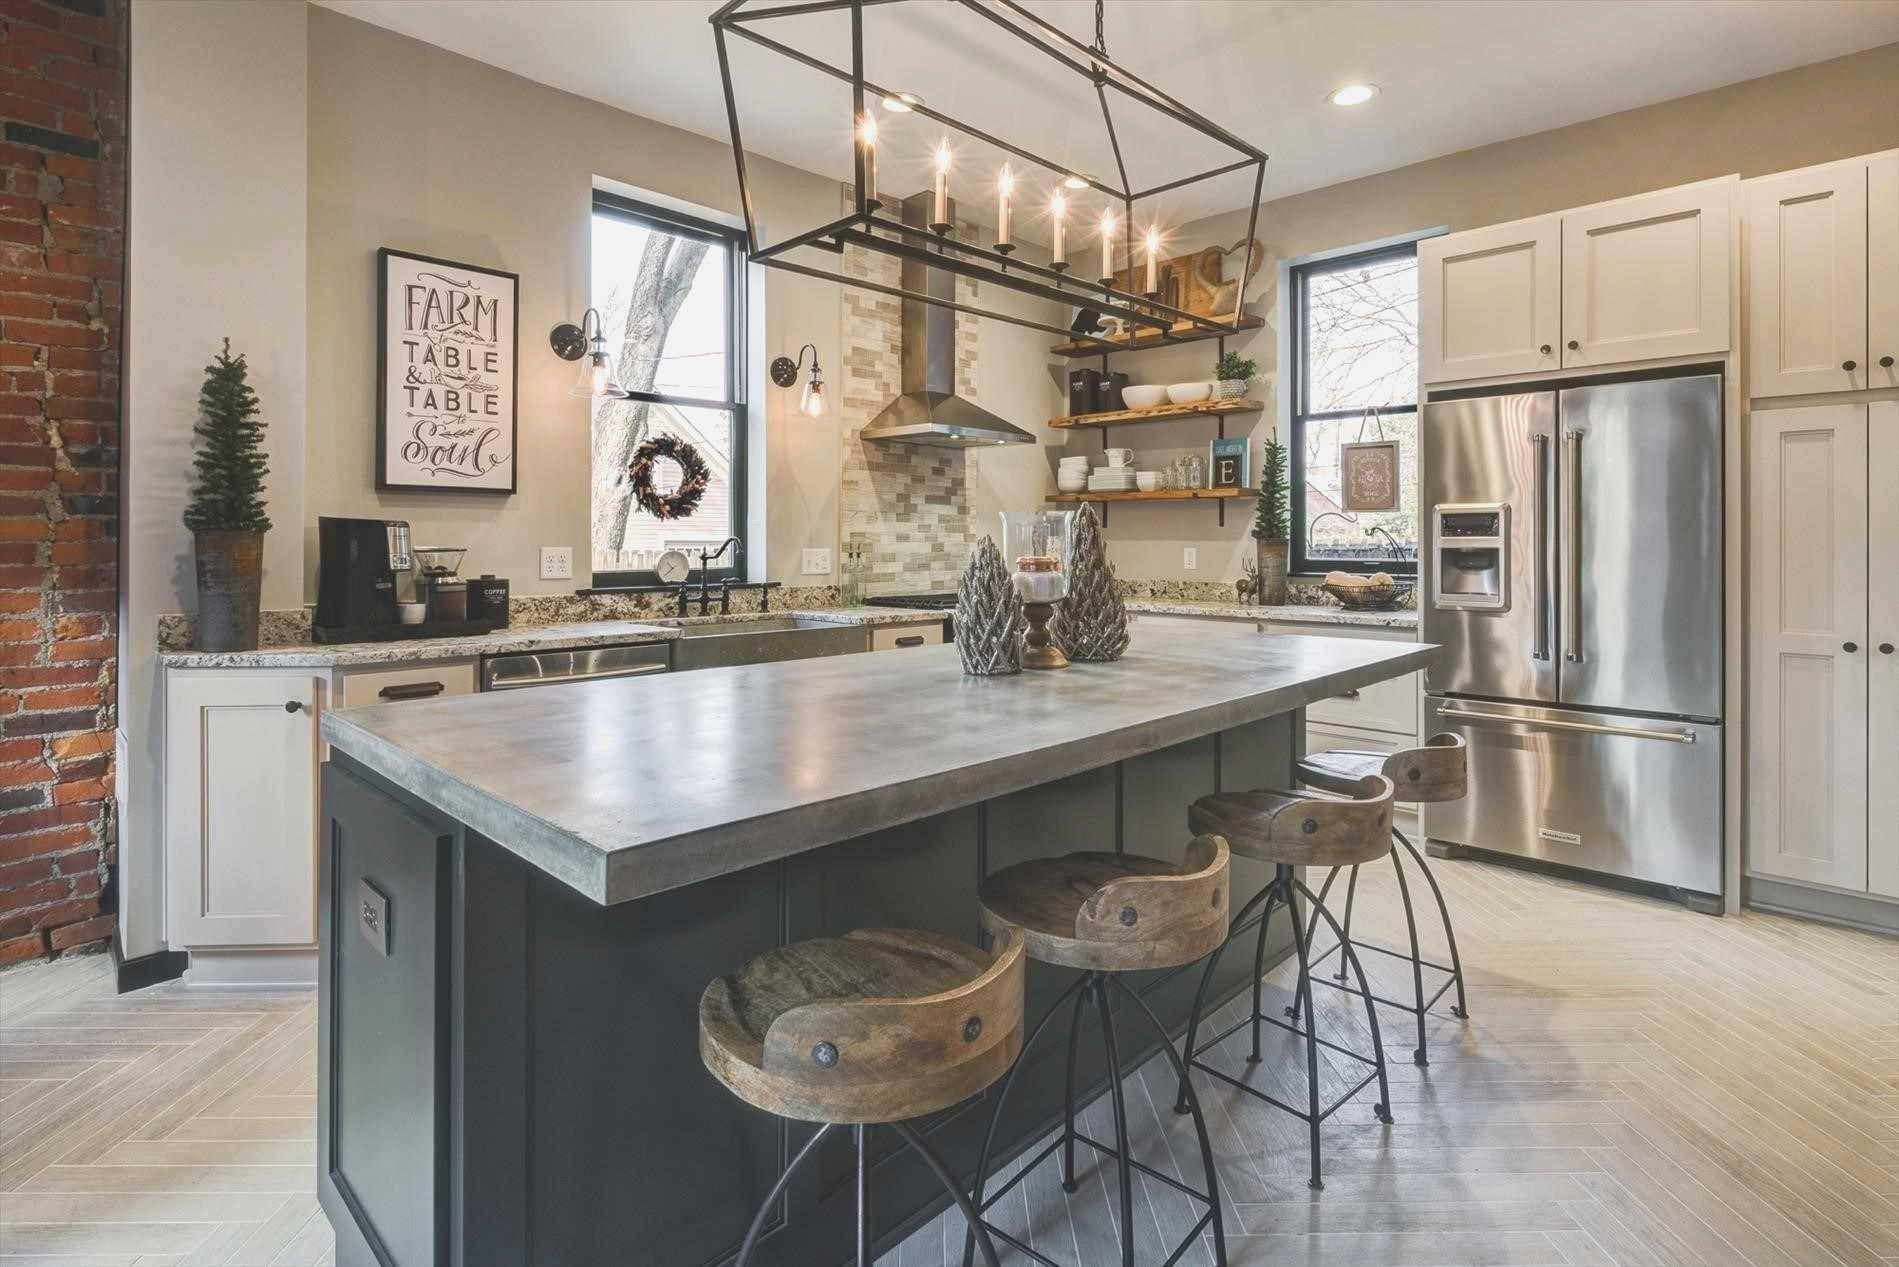 Kitchen island with butcher block black kitchen island with